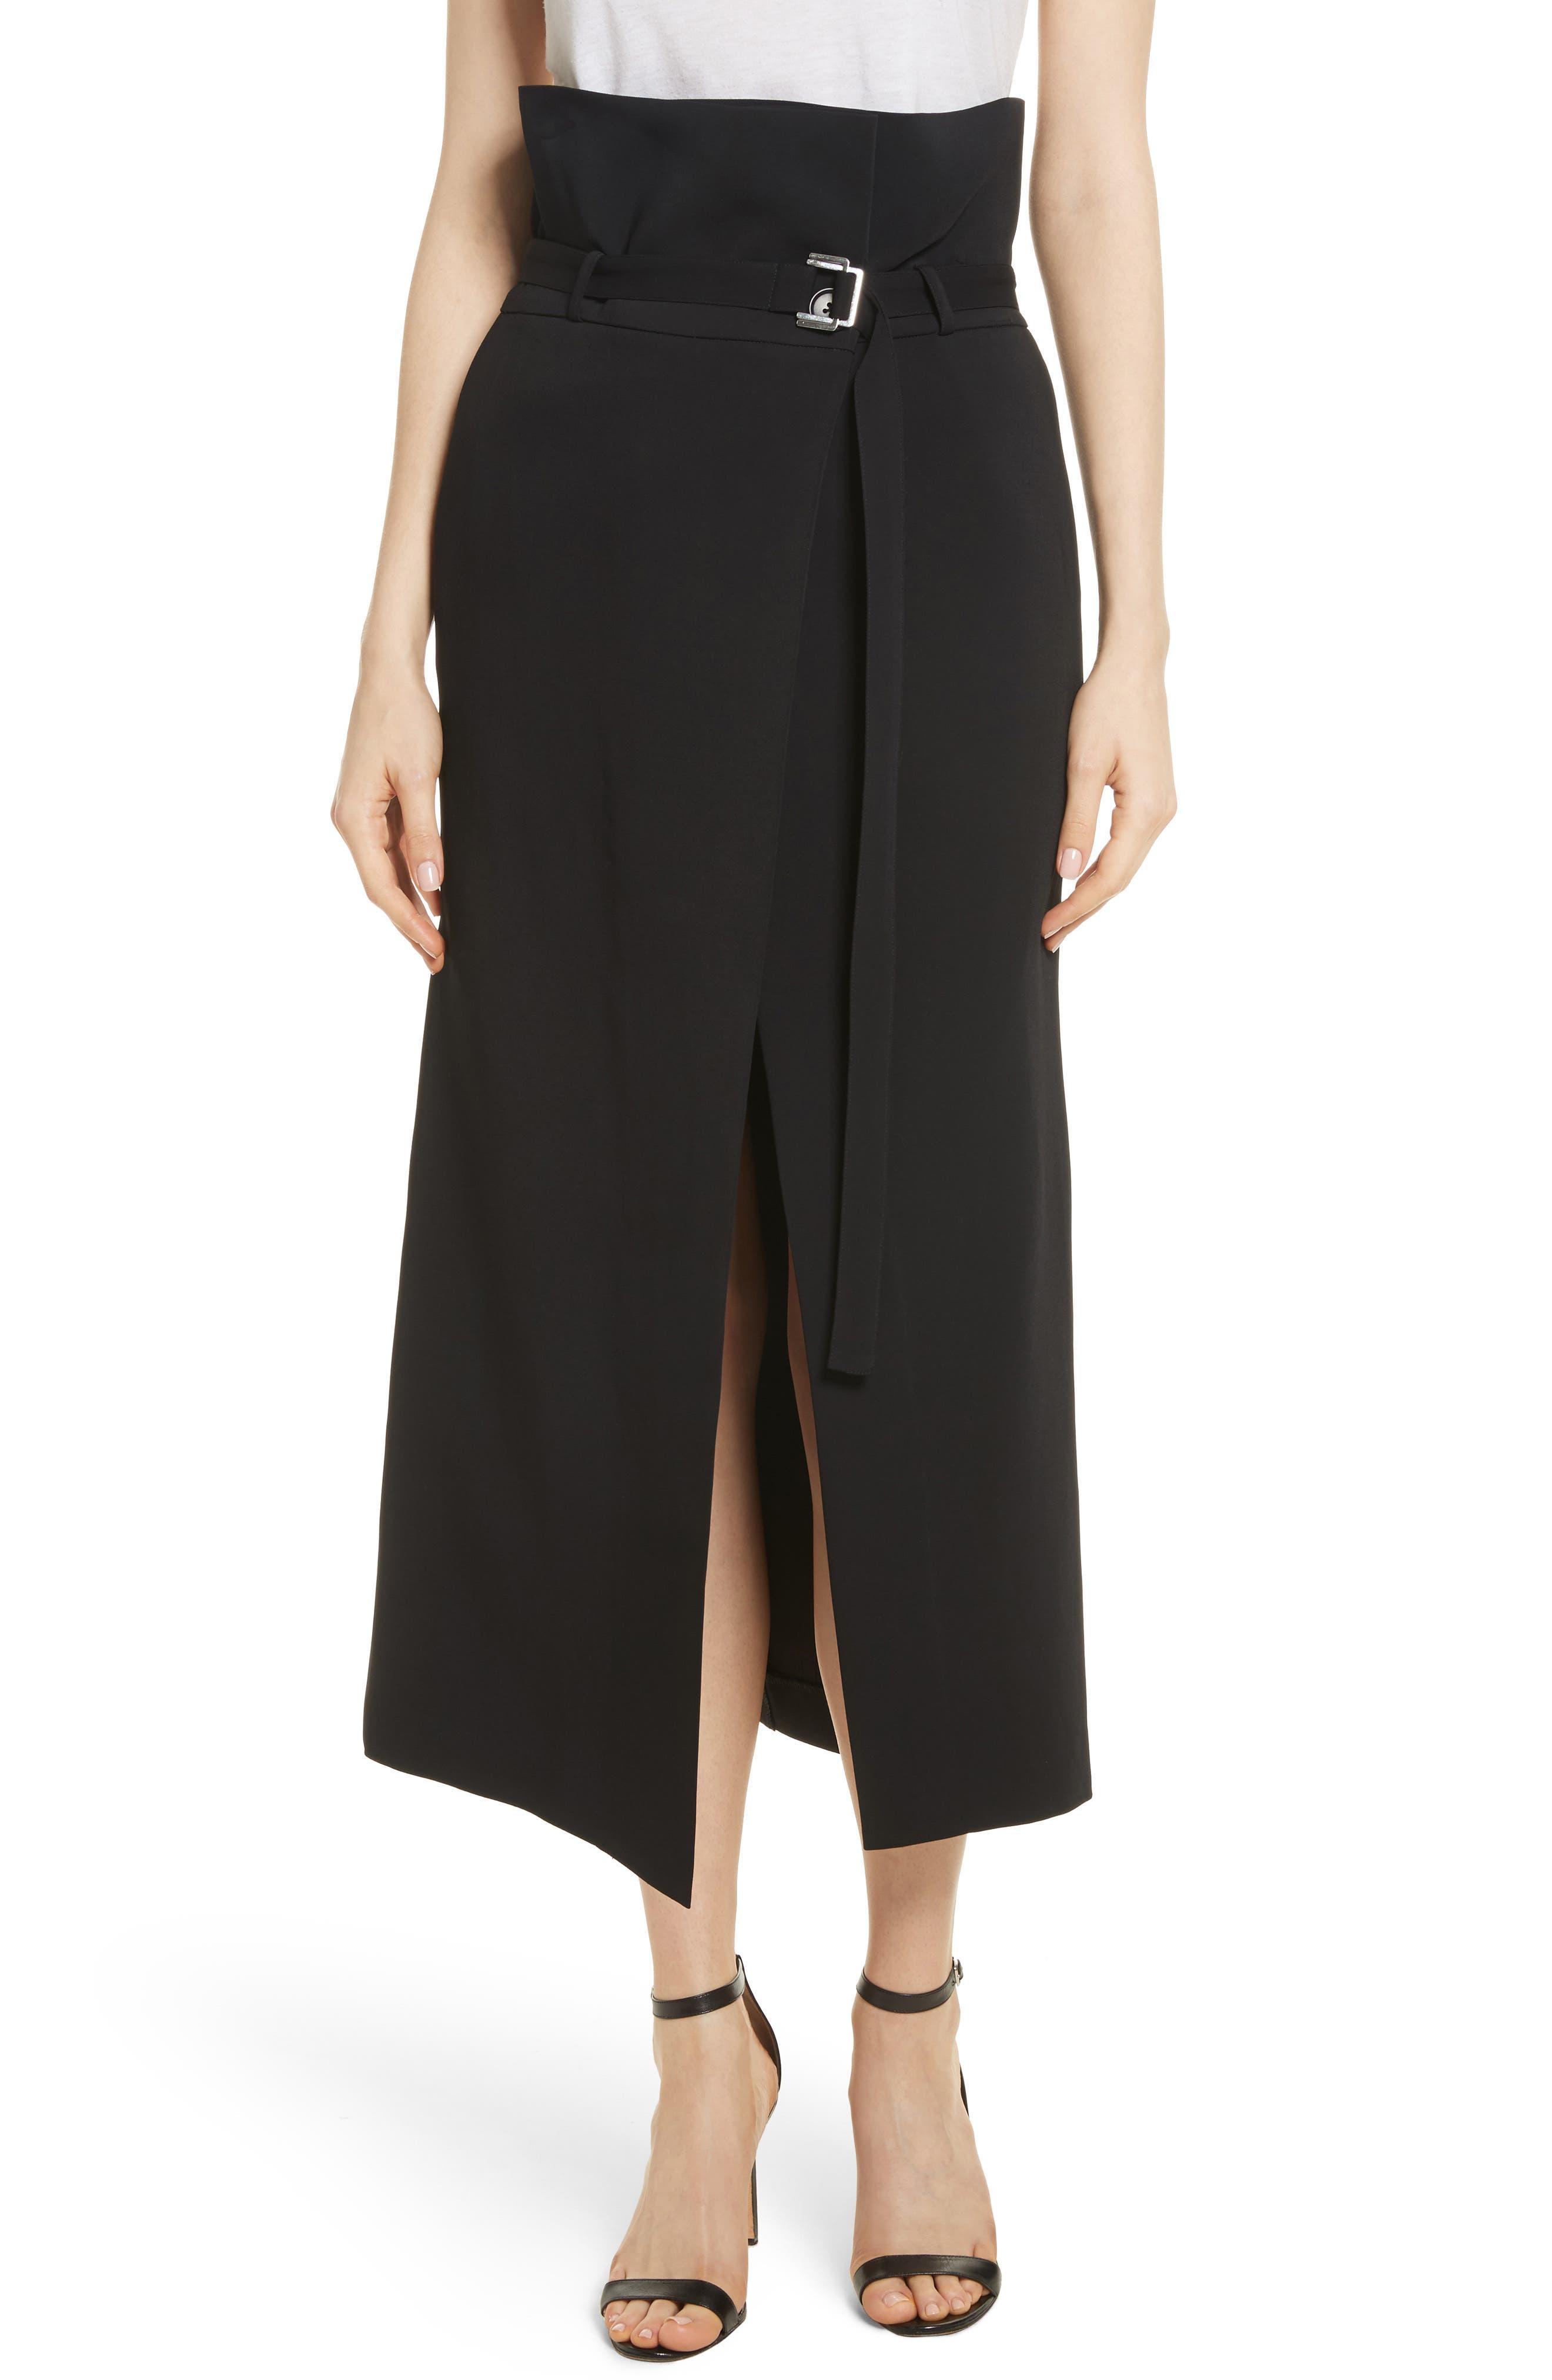 Alternate Image 1 Selected - Robert Rodriguez Paperbag Waist Split Front Skirt